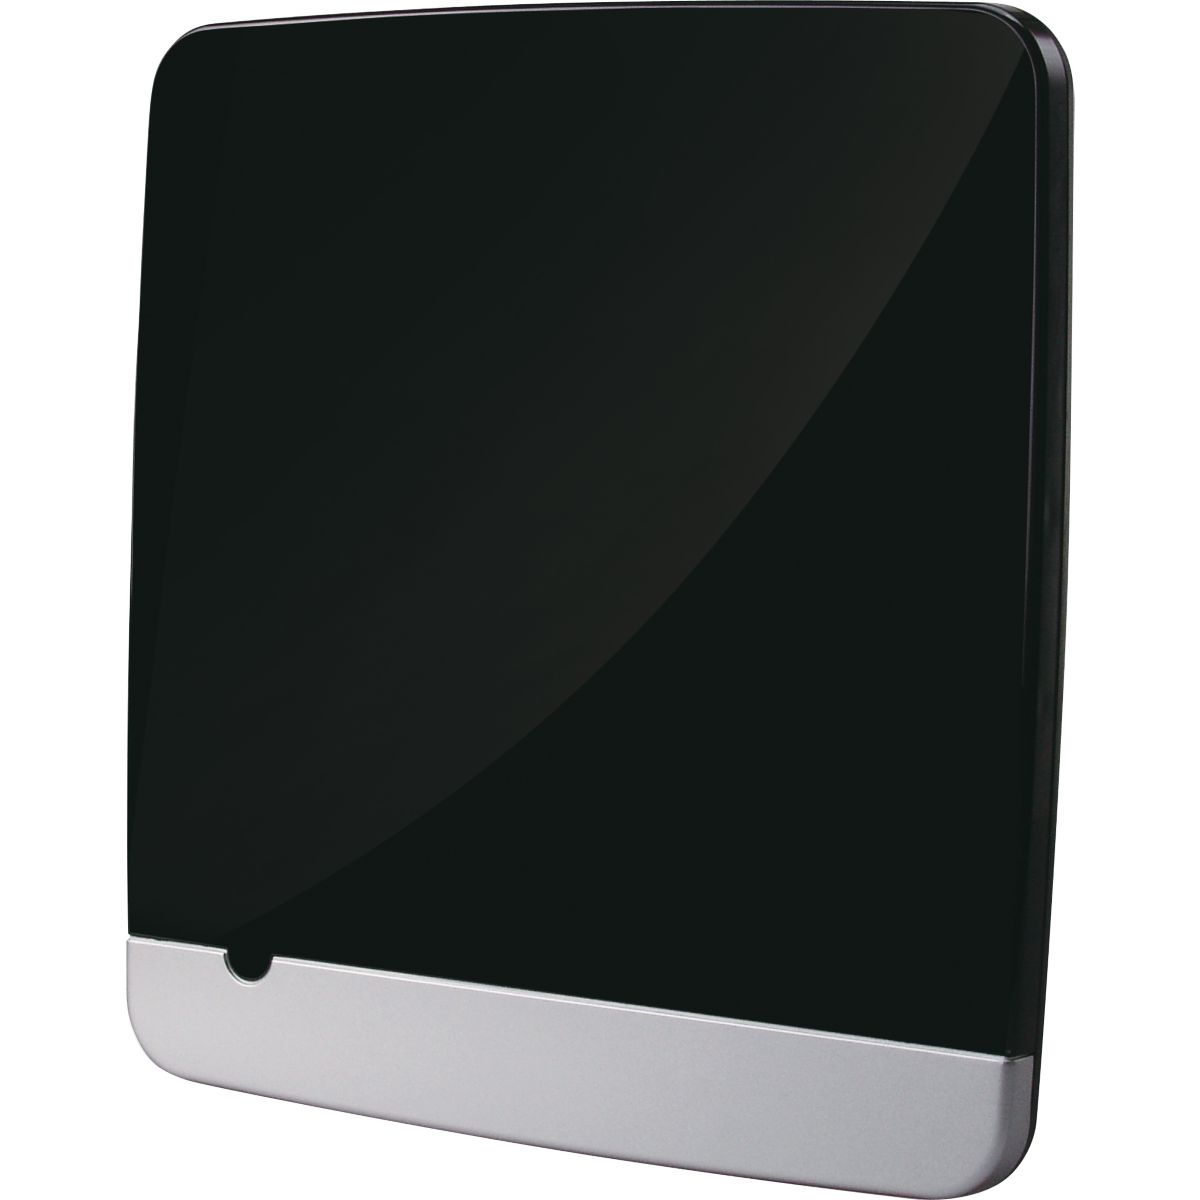 Antenne int�rieure essentielb melina ii 45db 4g - livraison offerte : code premium (photo)